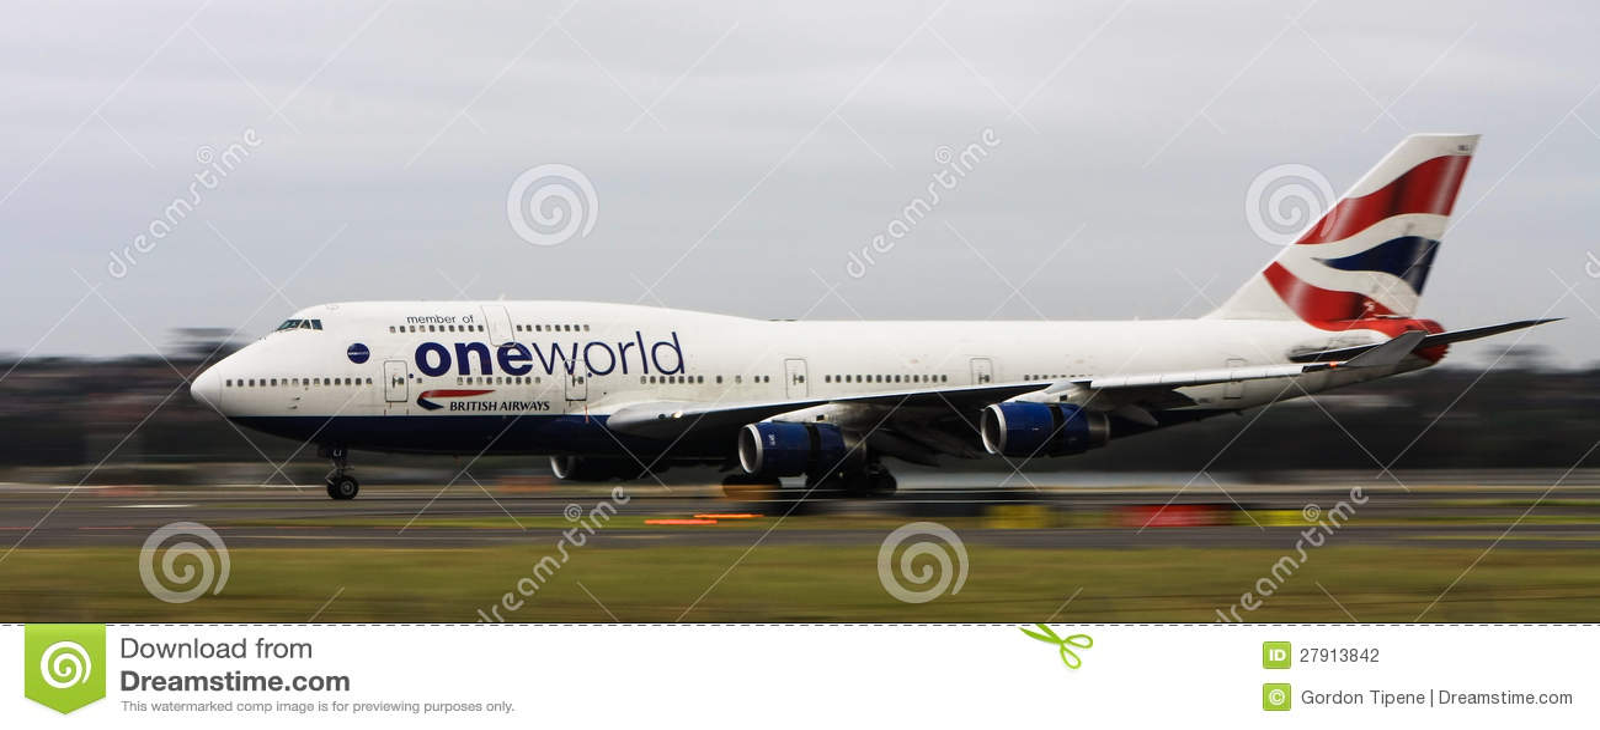 Britse luchtroutesBoeing747 straal op baan